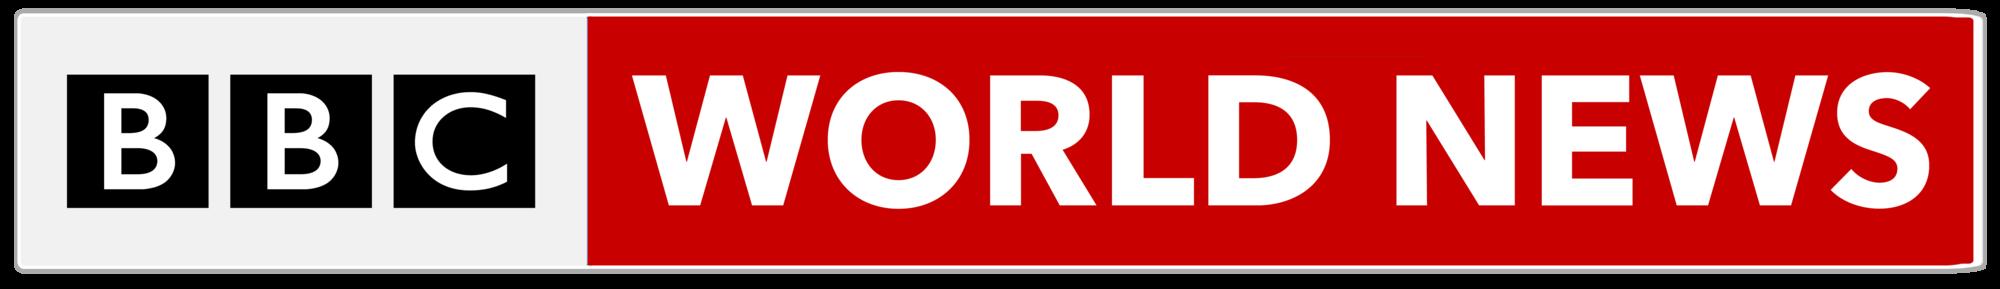 image bbc world news logo 2016png logopedia 2